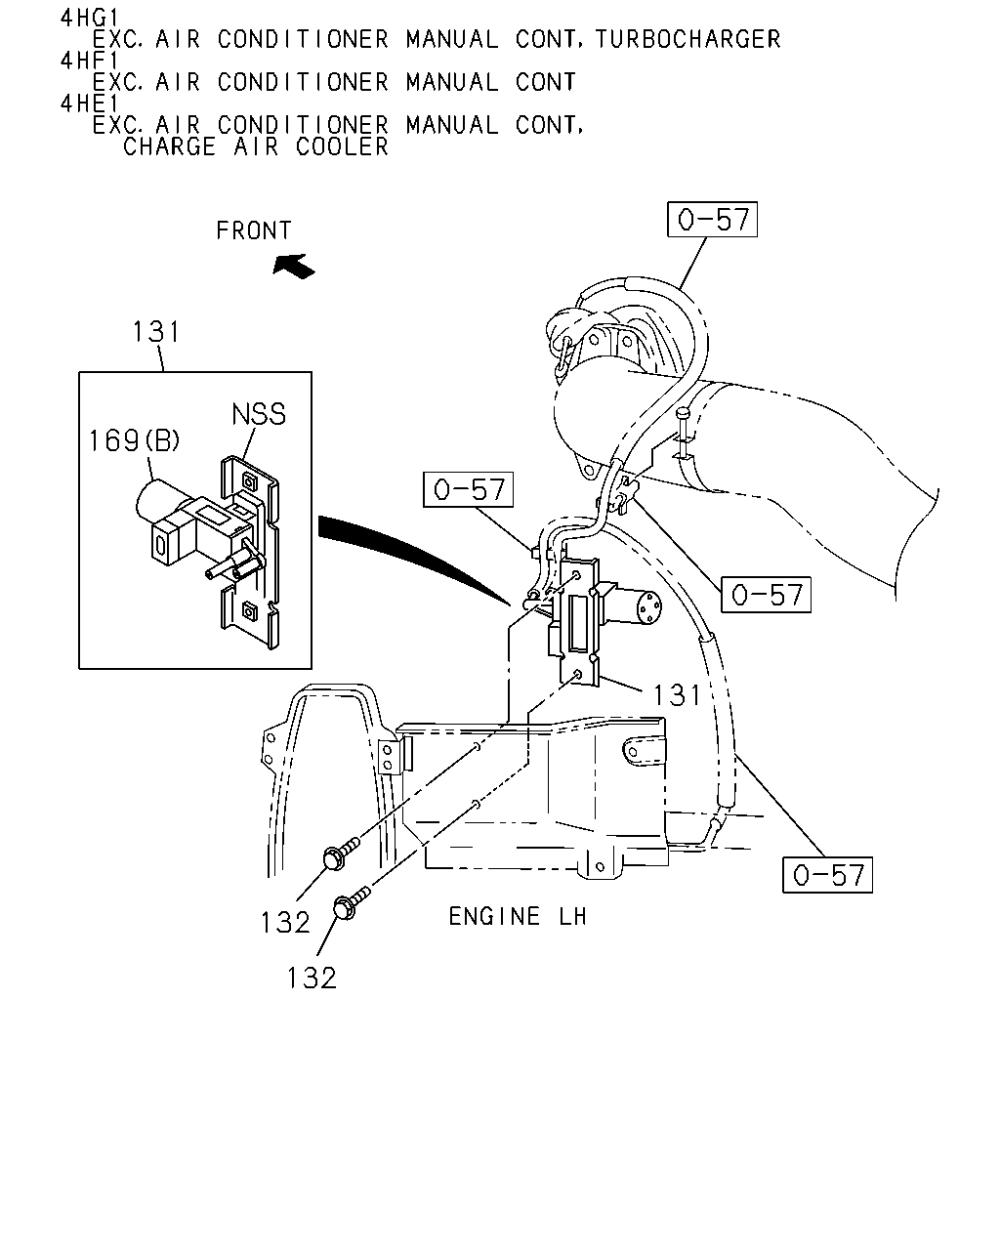 medium resolution of isuzu 4he1 engine diagram wiring library 2006 isuzu ascender engine diagram isuzu 4he1 engine diagram